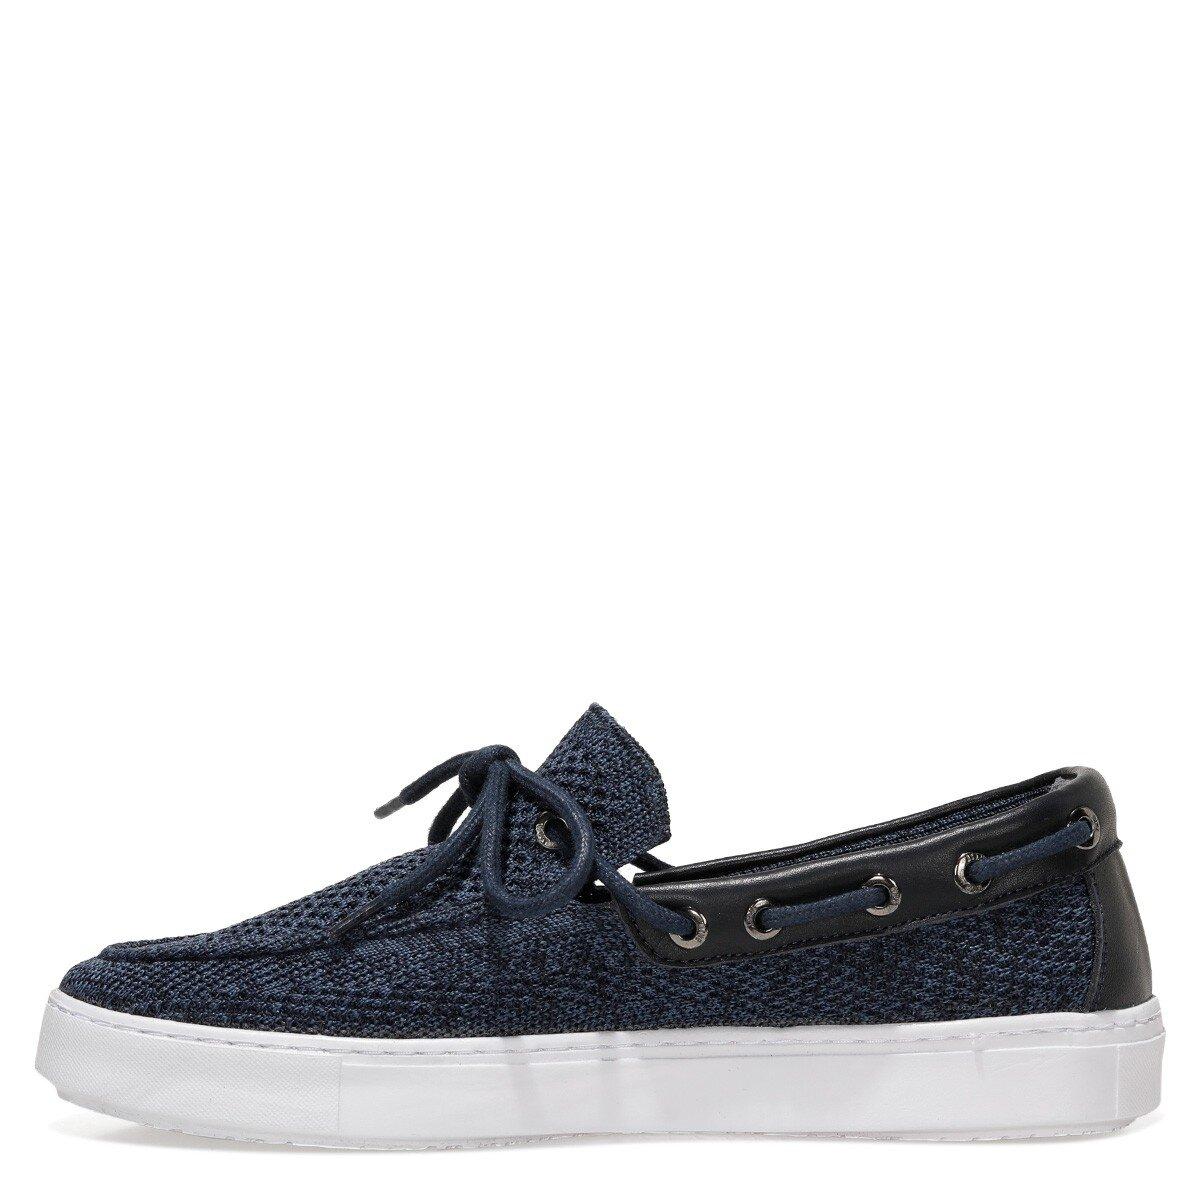 TORKA 1FX Lacivert Erkek Ayakkabı